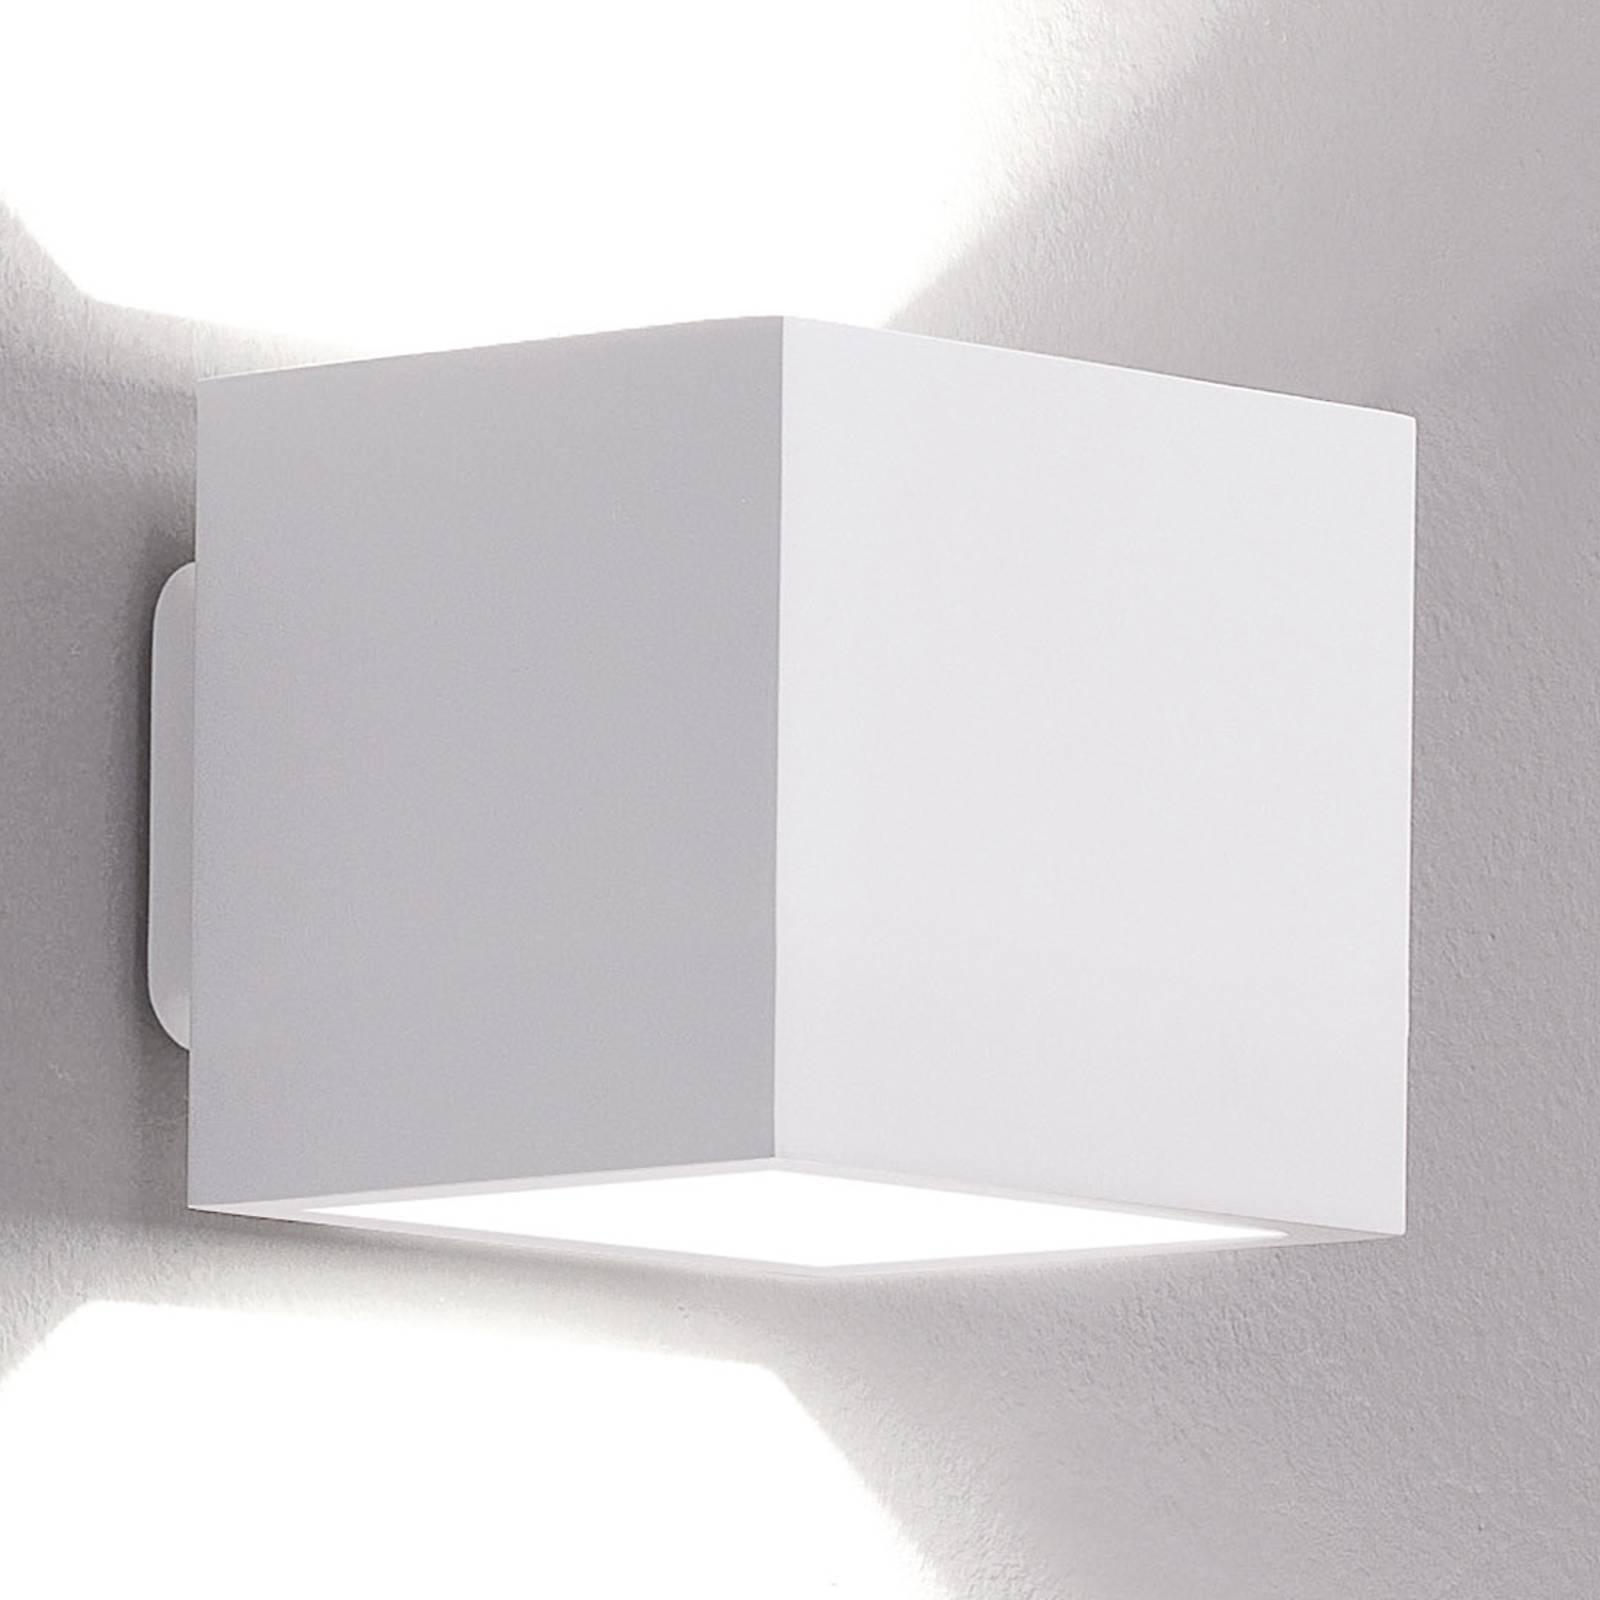 ICONE Cubò LED-Wandleuchte, 10 W, weiß